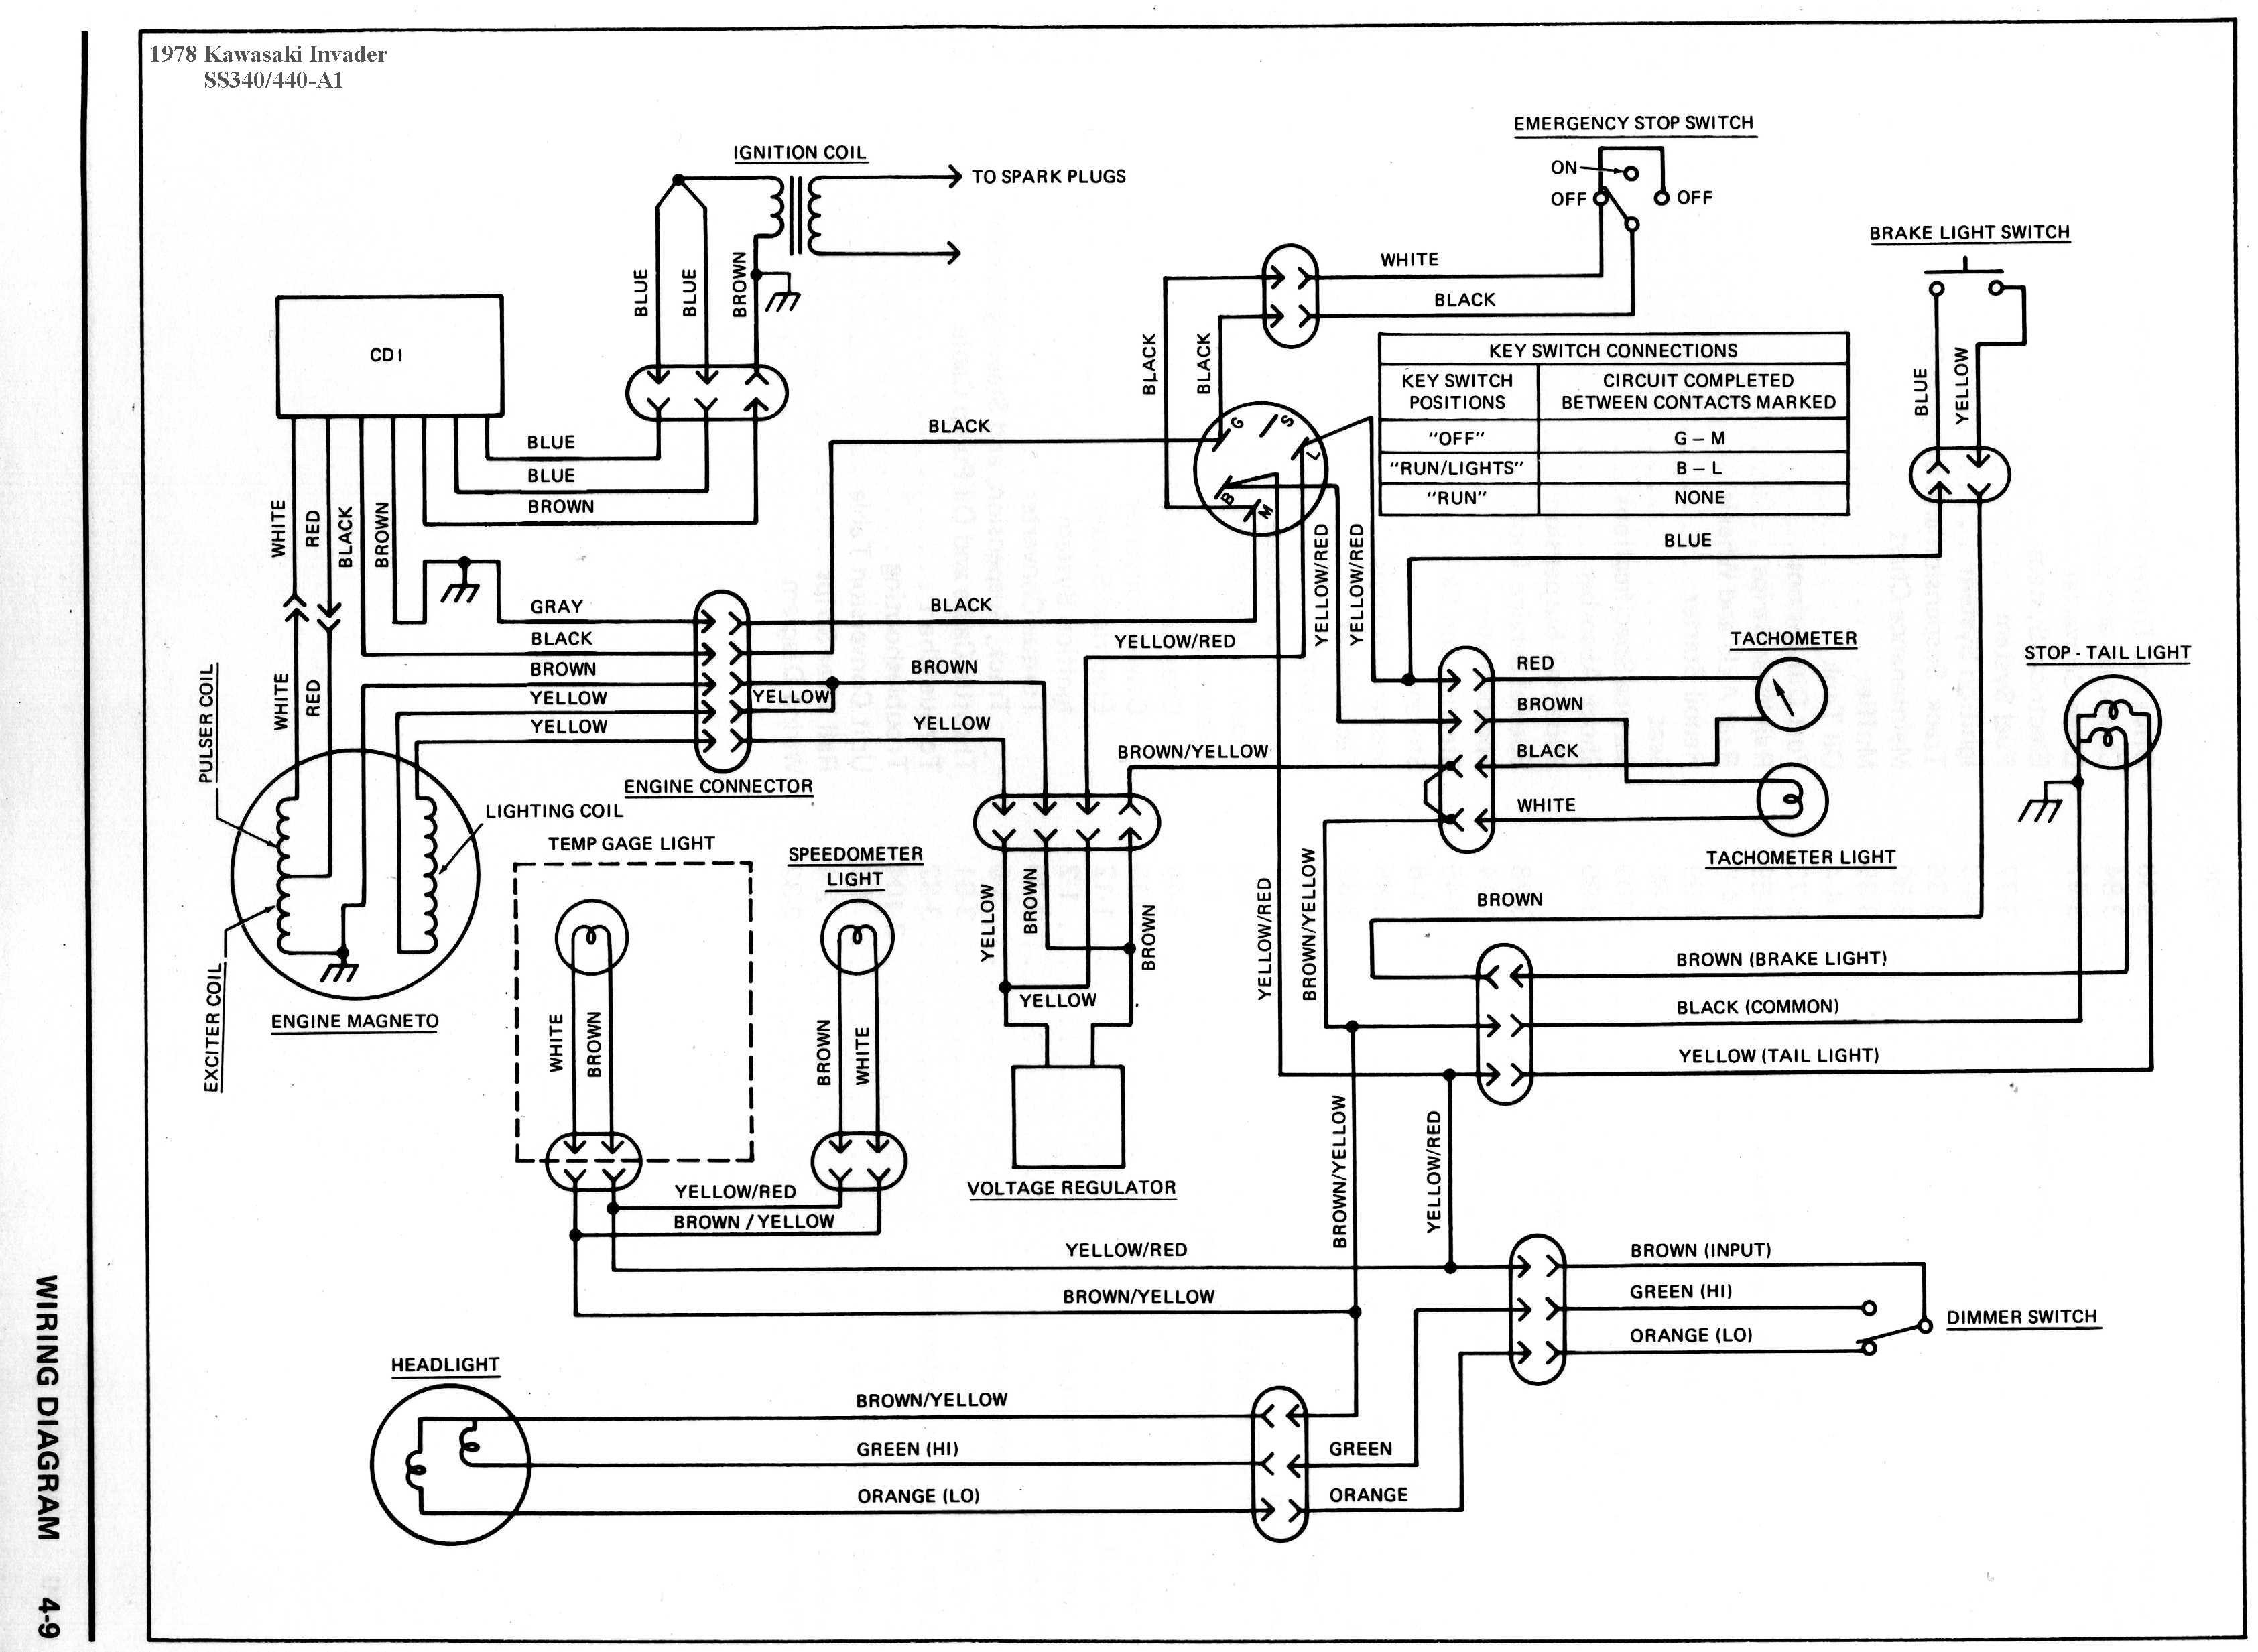 Kawasaki Mule Wiring Schematic